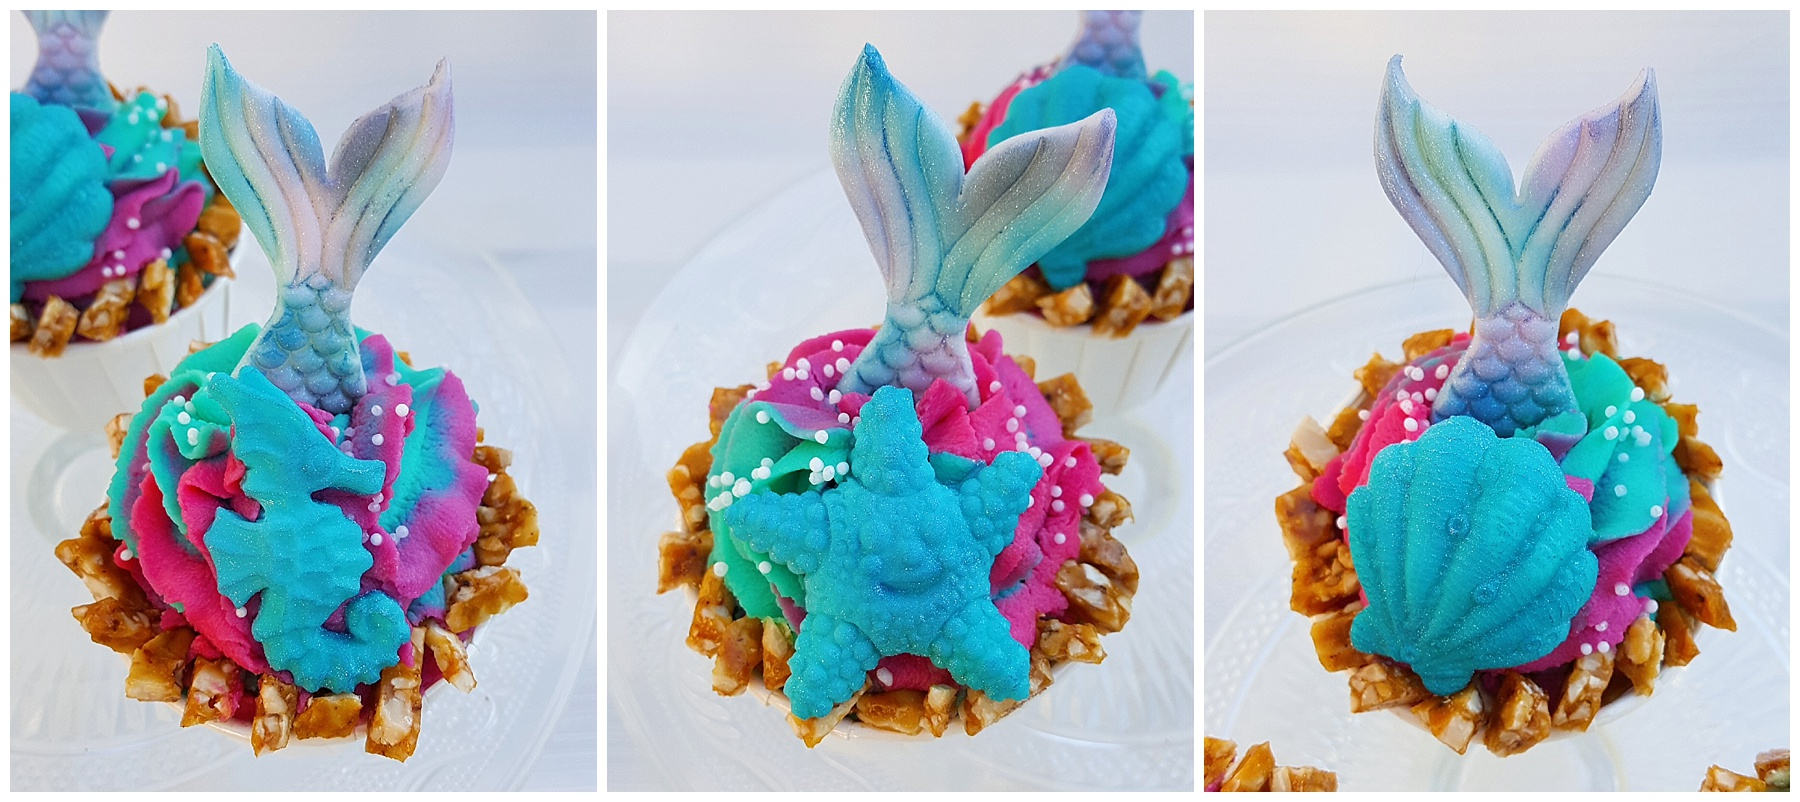 Ananas-Kokos-Cupcakes mit Knusper von Silkes Backzauber